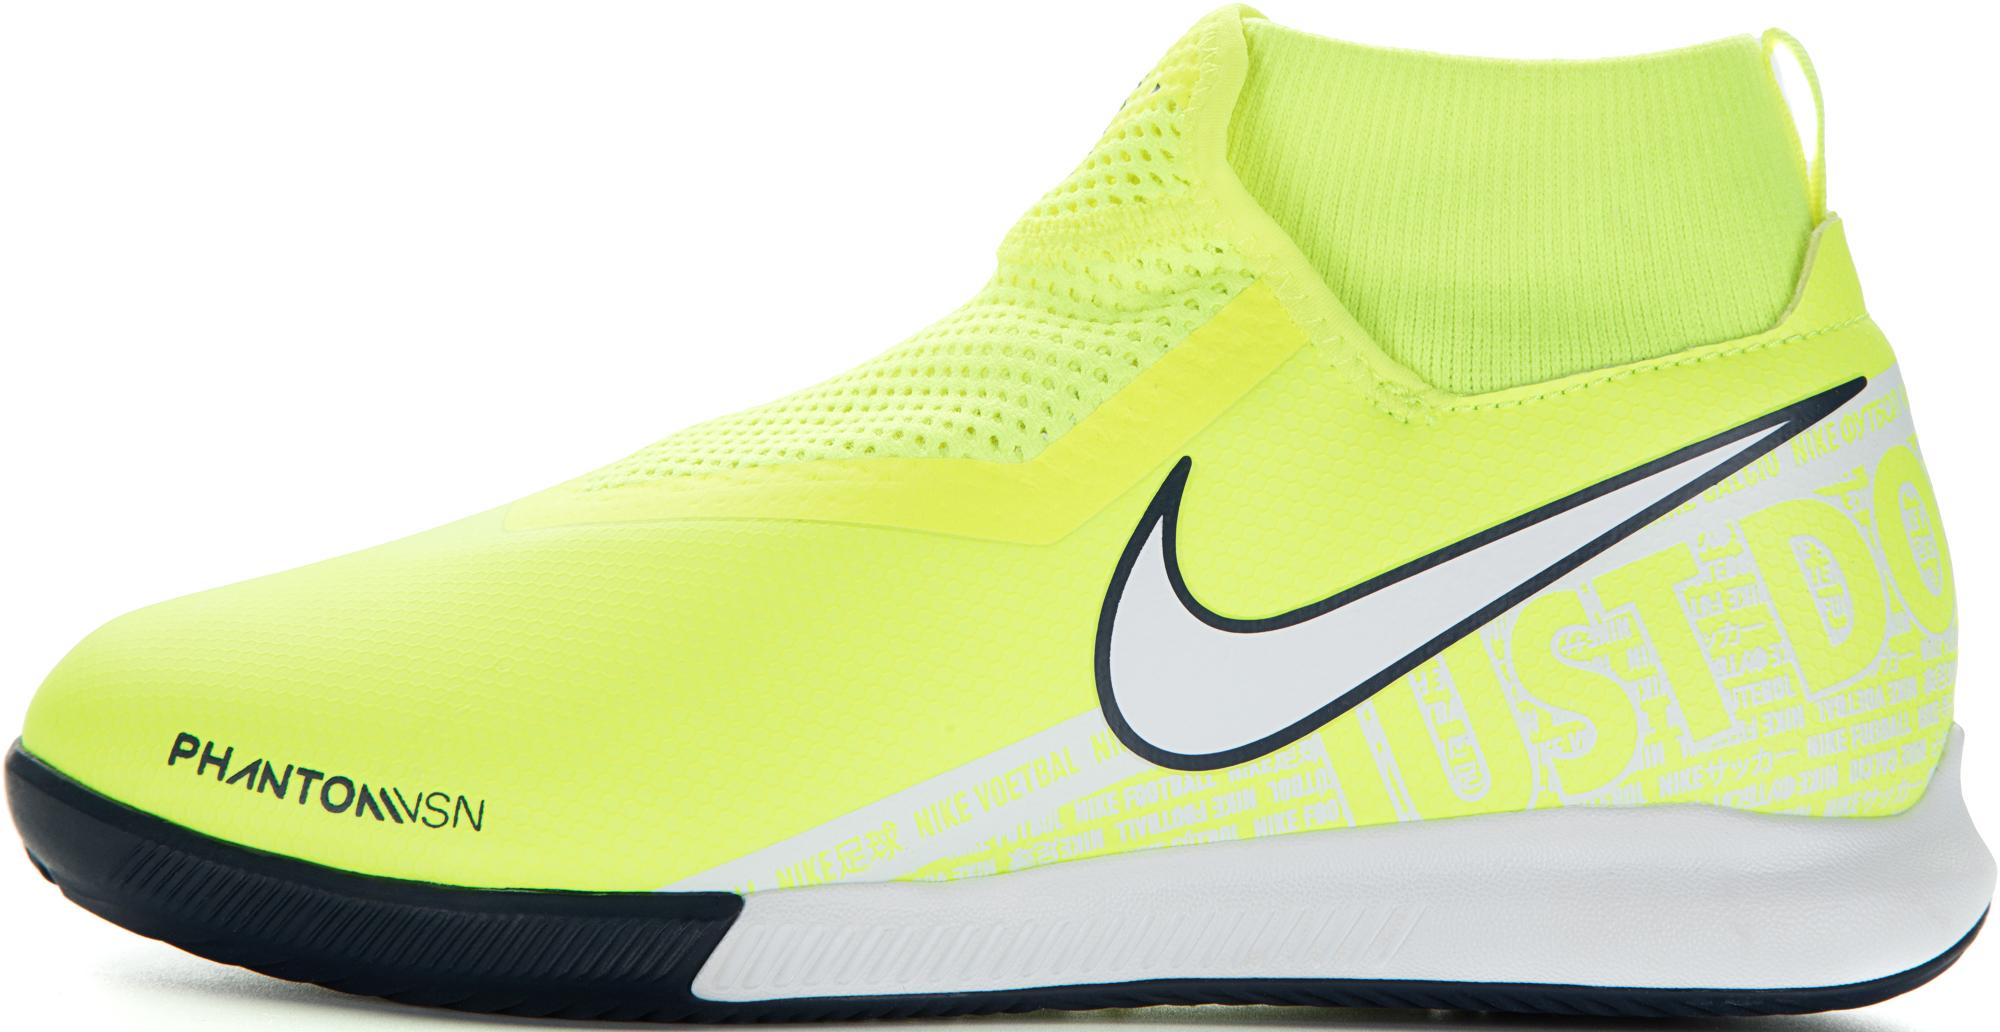 Nike Бутсы для мальчиков Jr. Phantom Vision Academy Dynamic Fit IC, размер 37,5